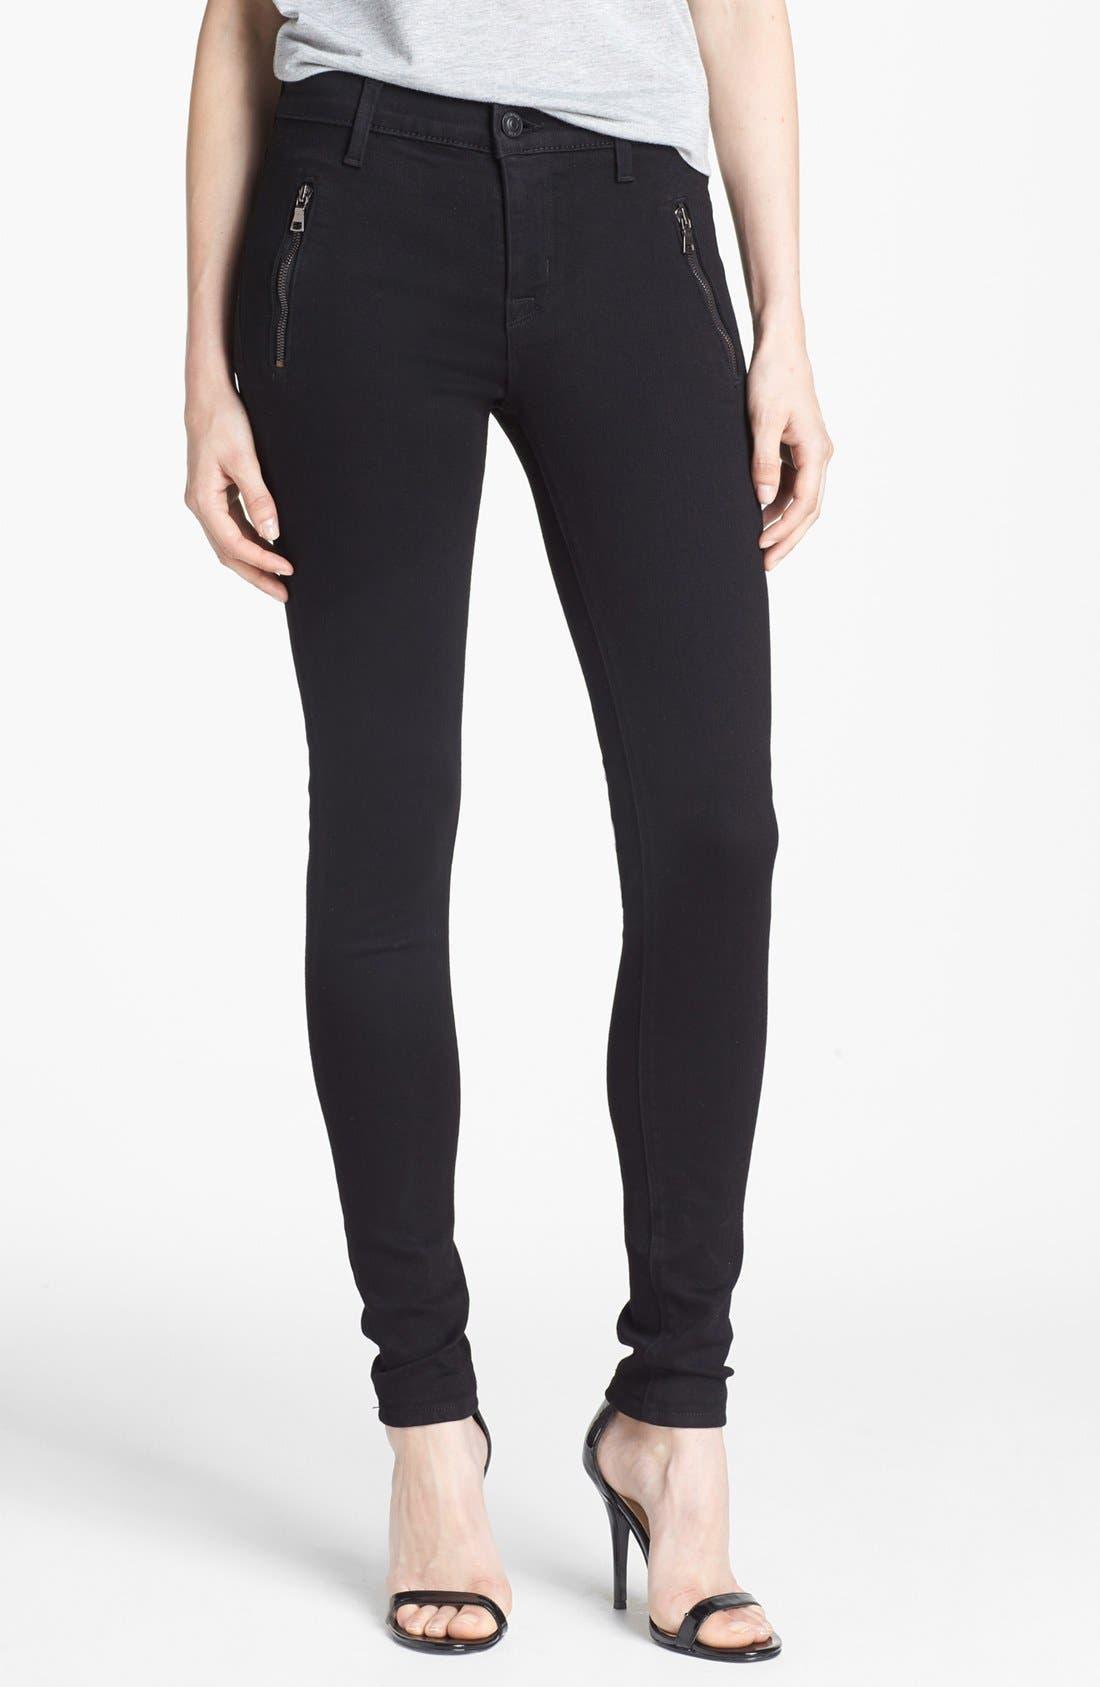 Main Image - Hudson Jeans 'Biker' Skinny Jeans (Black)